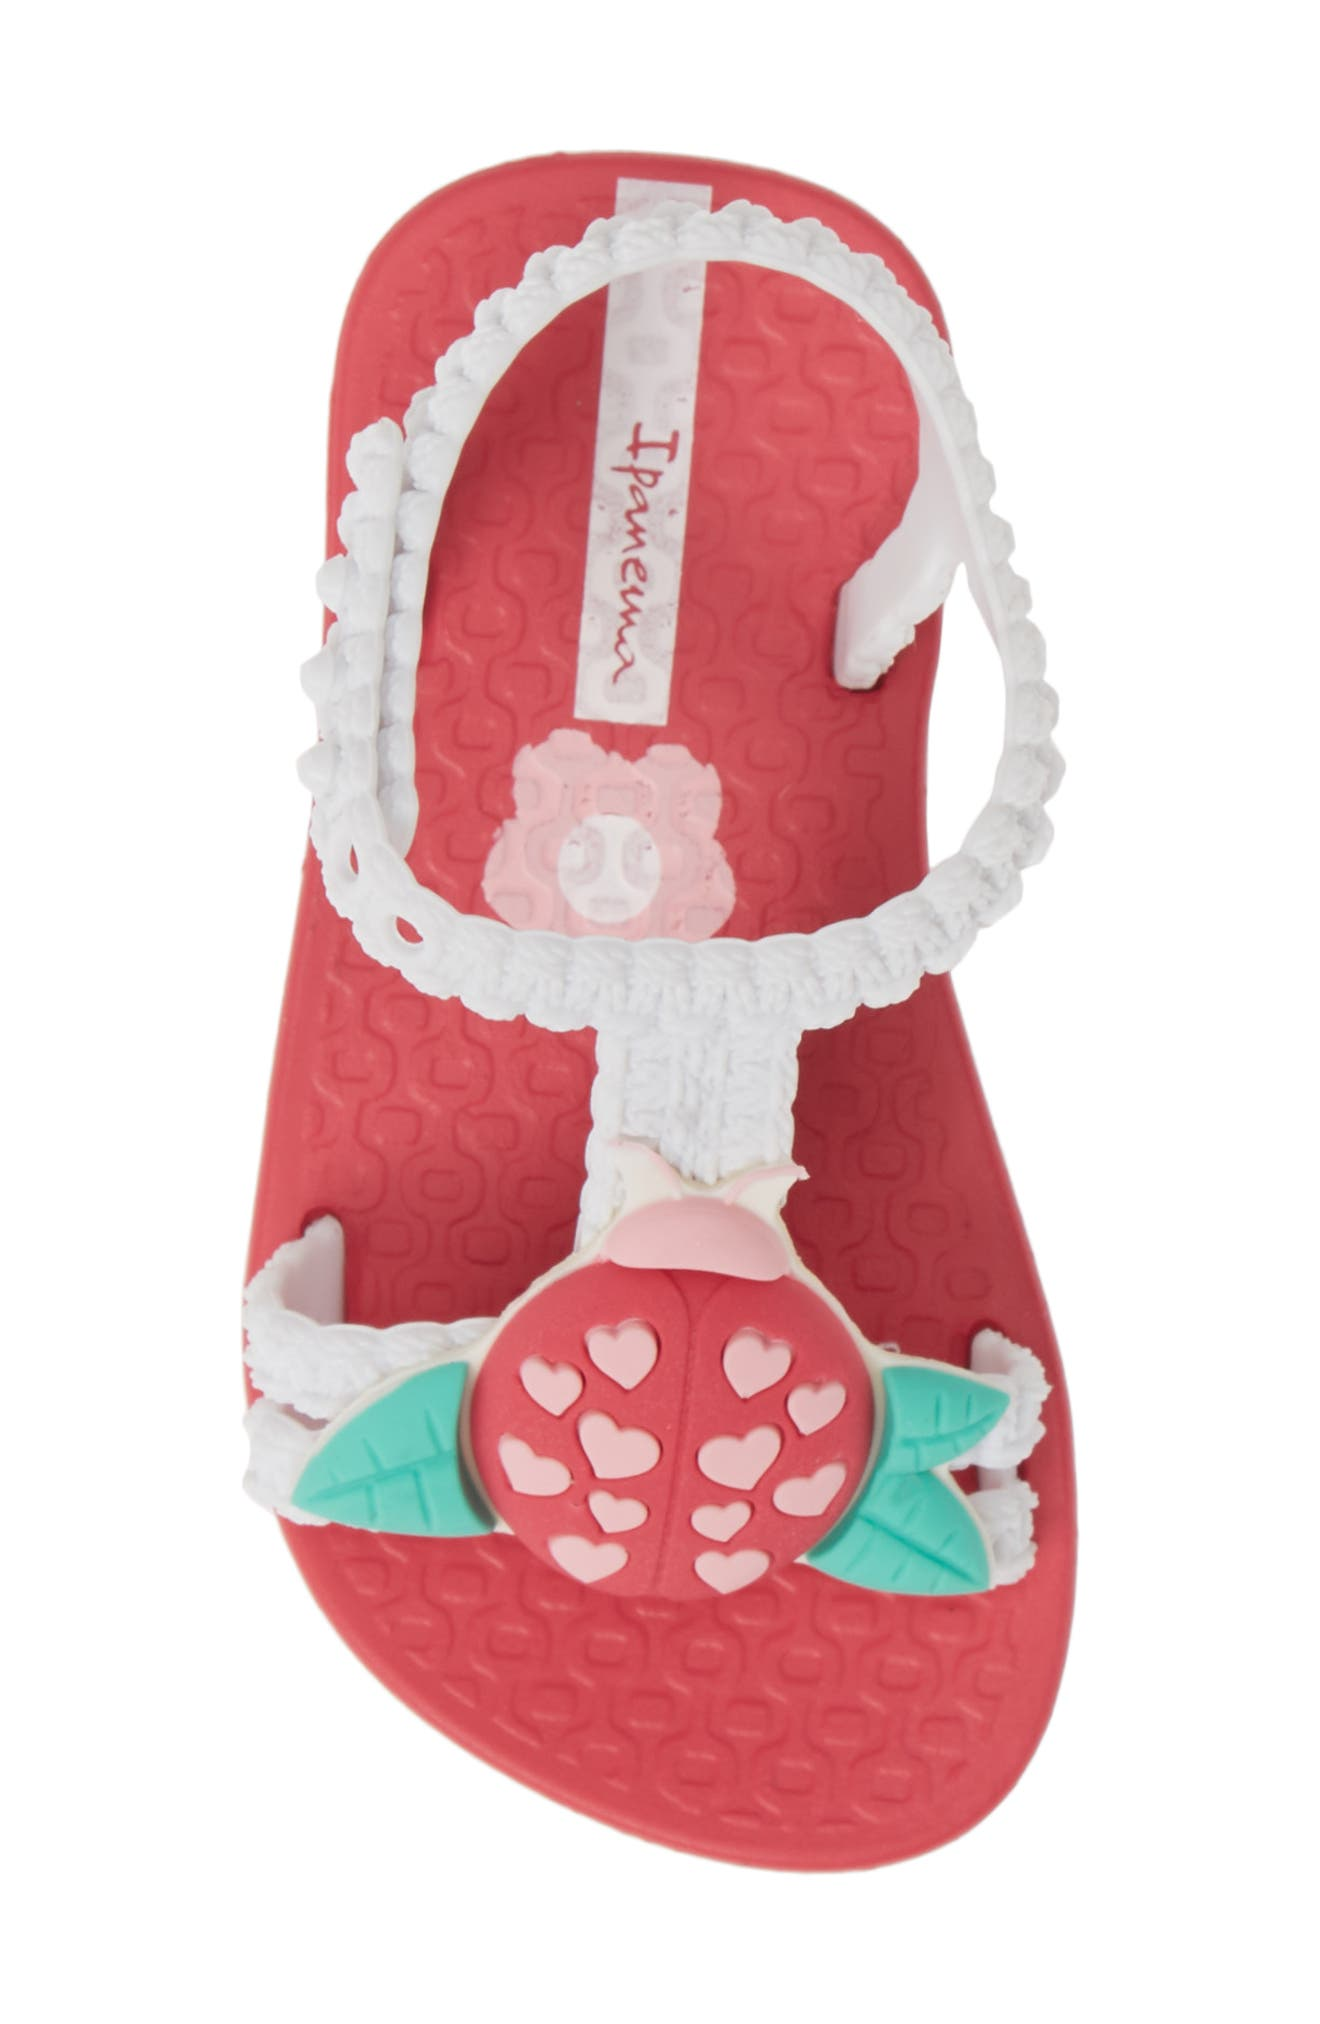 IPANEMA, Buggy Baby Sandal, Alternate thumbnail 5, color, PINK/ WHITE